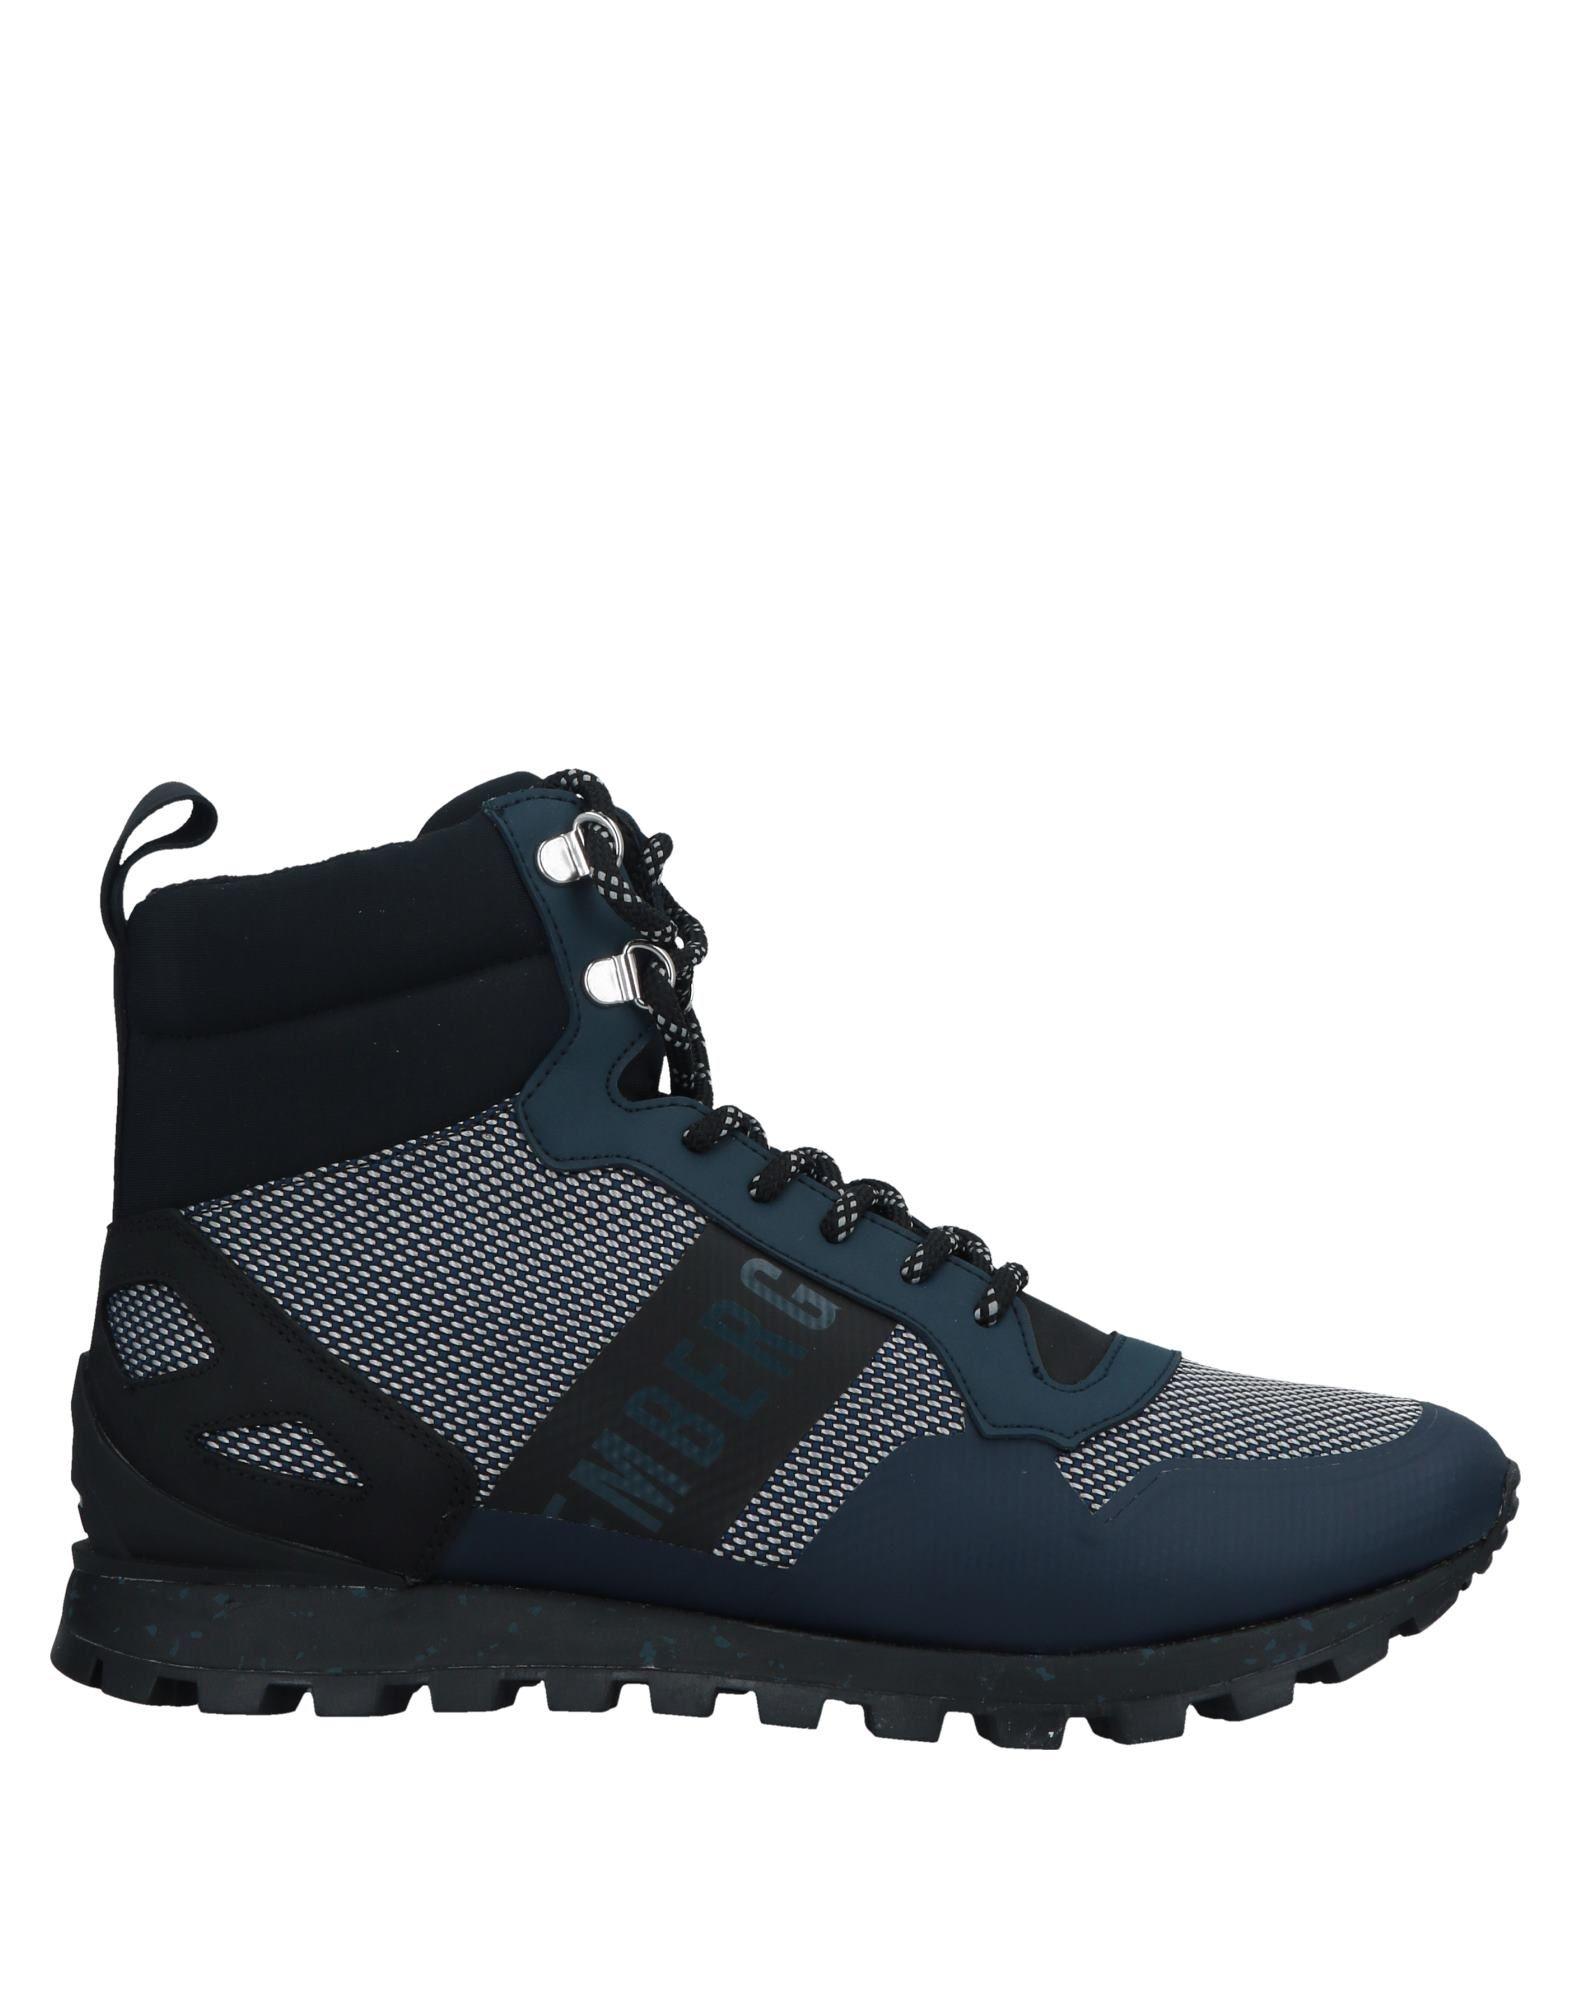 on sale a92c3 ab335 Sneakers in Dark Blue